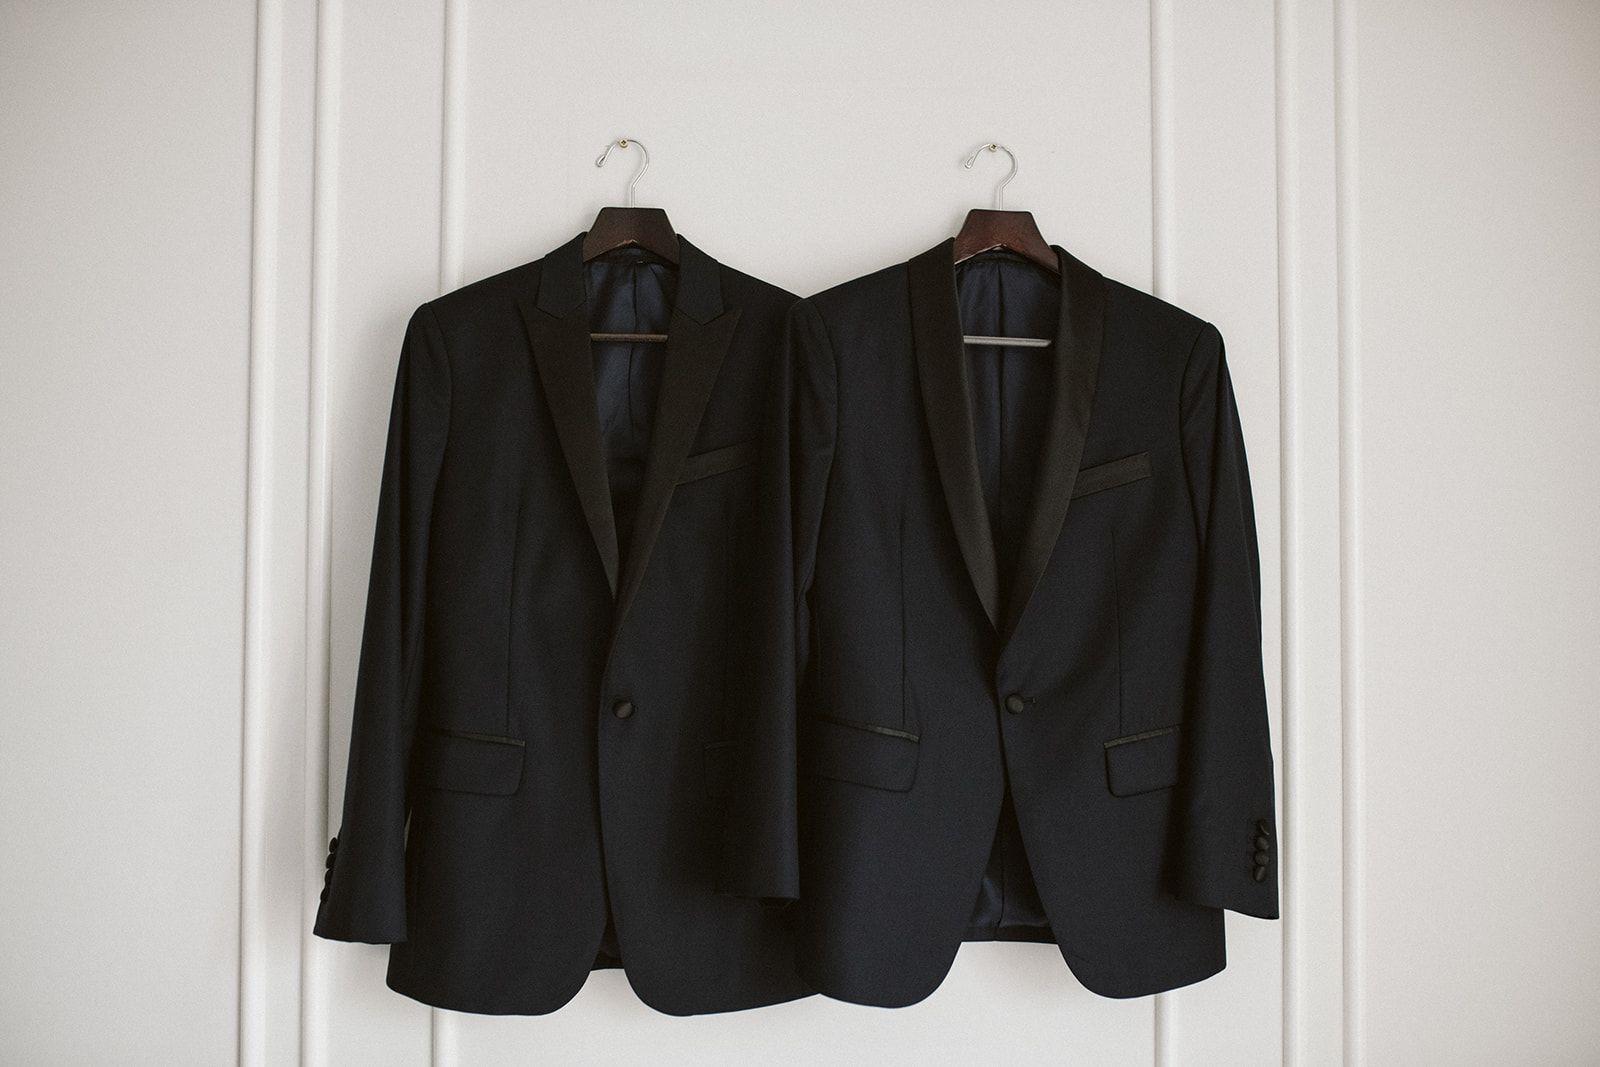 Pair of tuxedo jackets hanging up